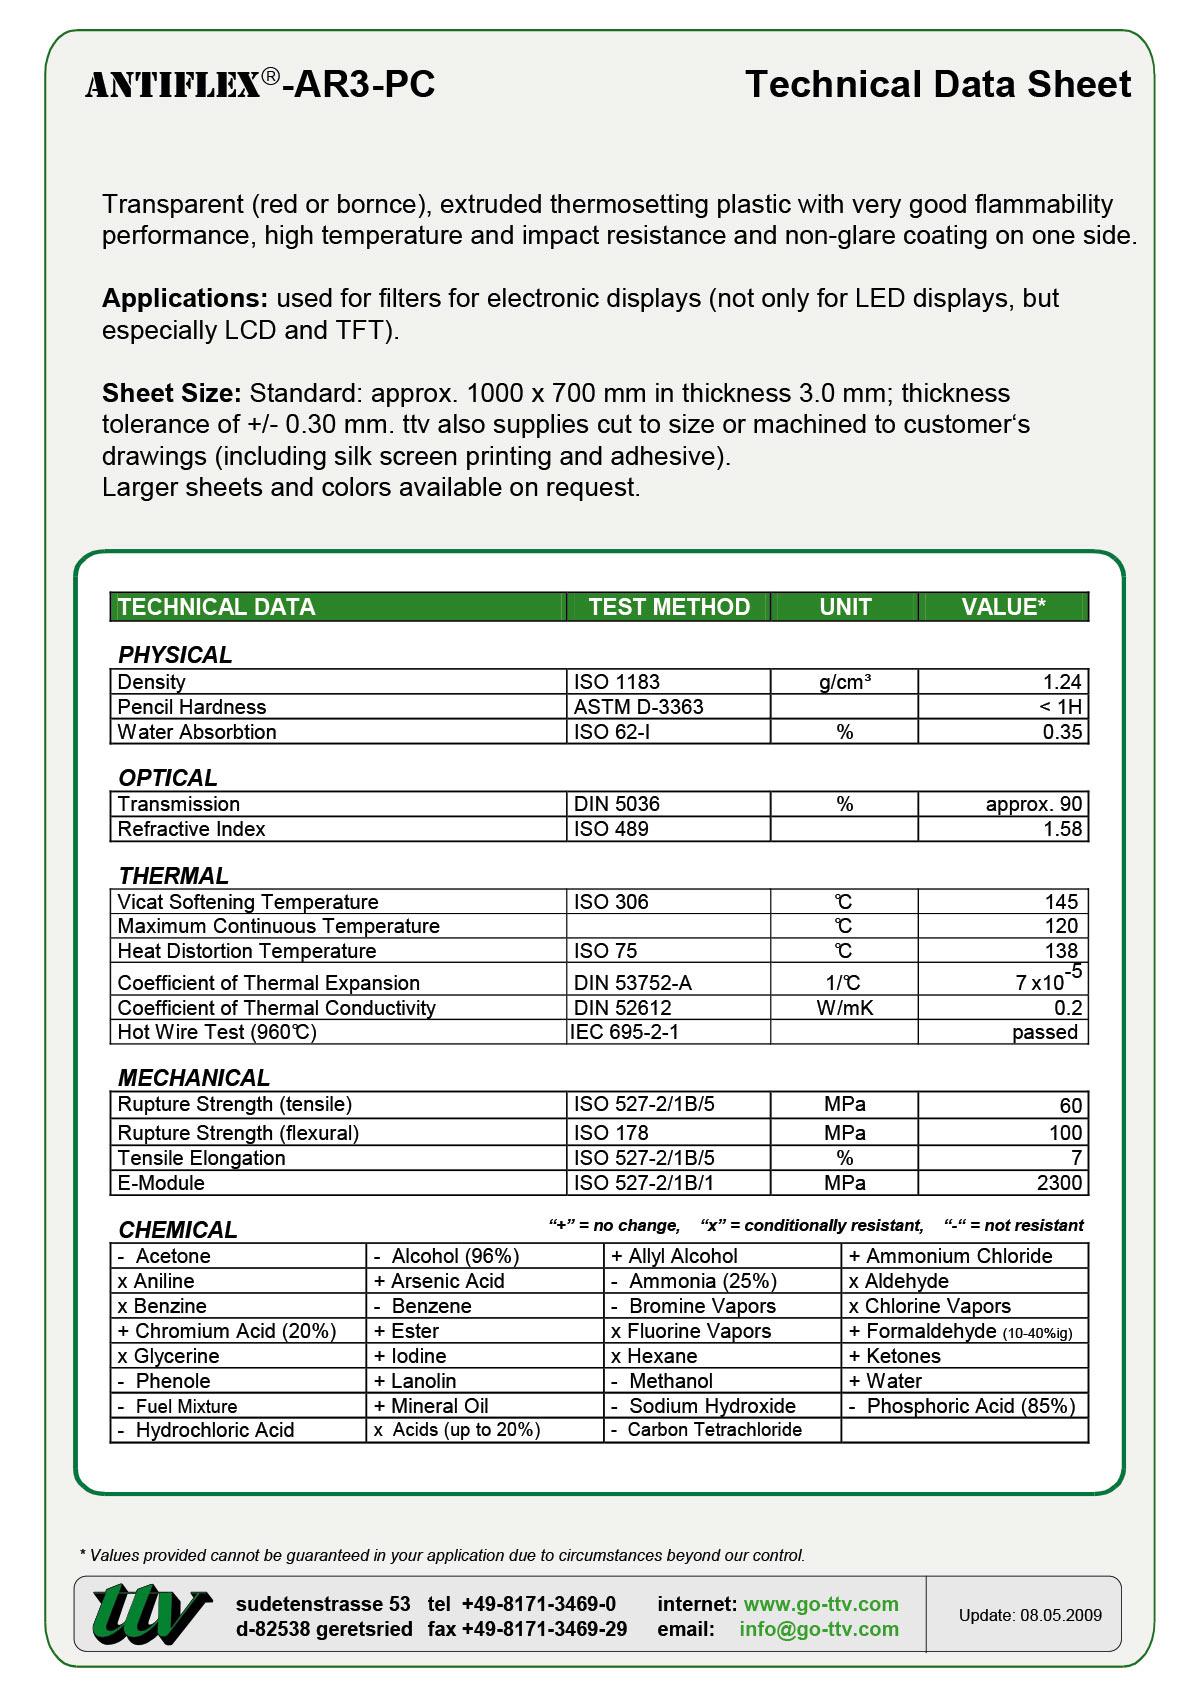 ANTIFLEX-AR3-PC Data sheet